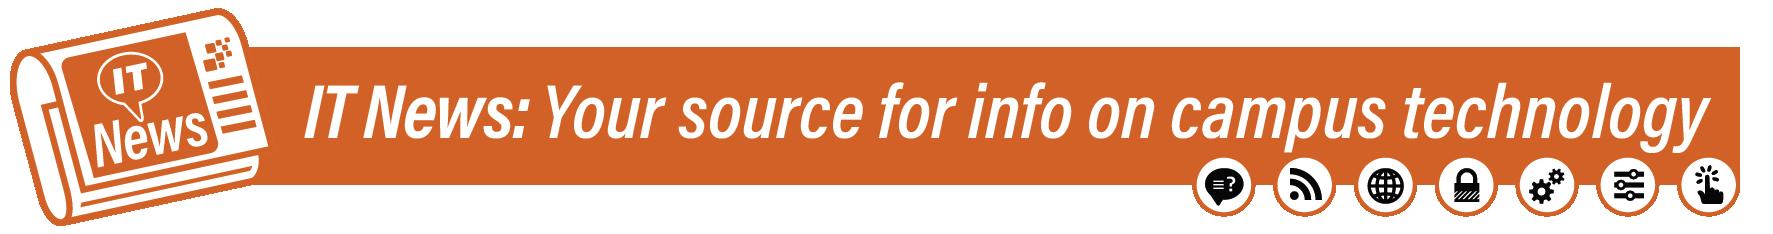 IT News Banner